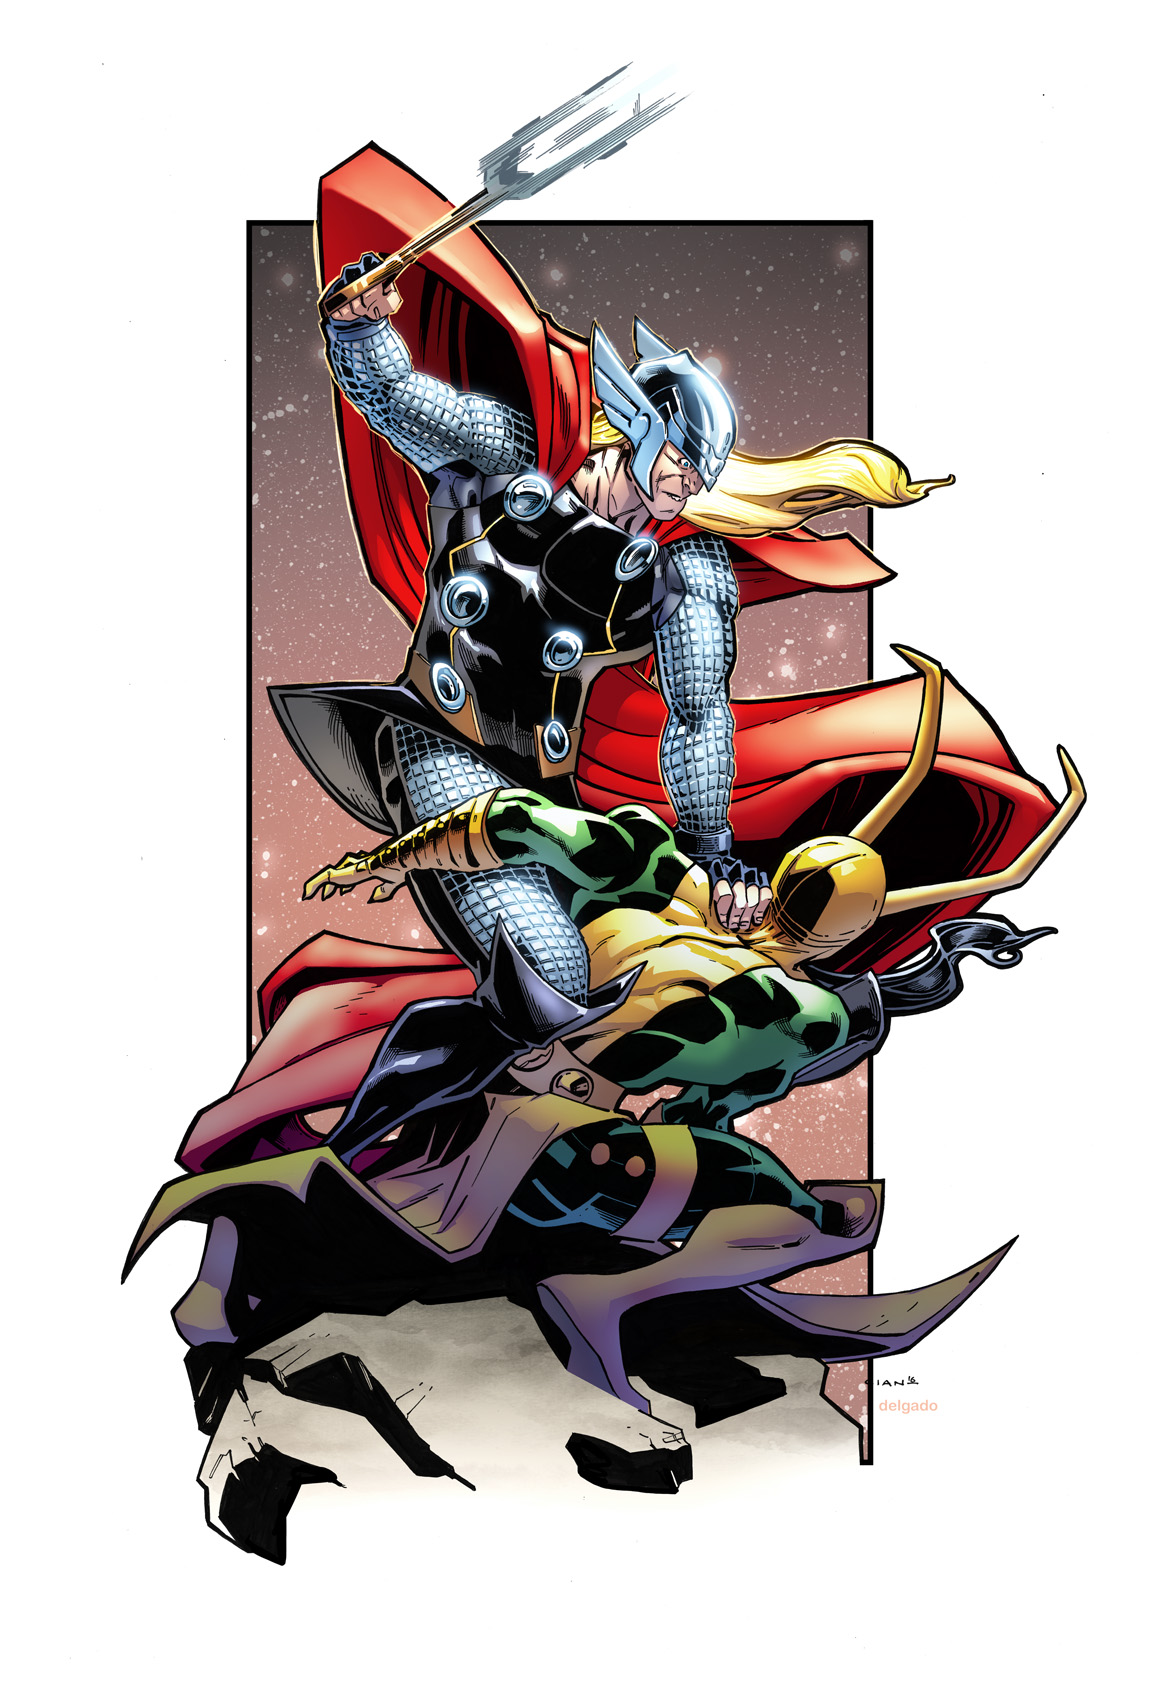 Thor V Loki - By Cian Tormey, colours by Edgar Delgado